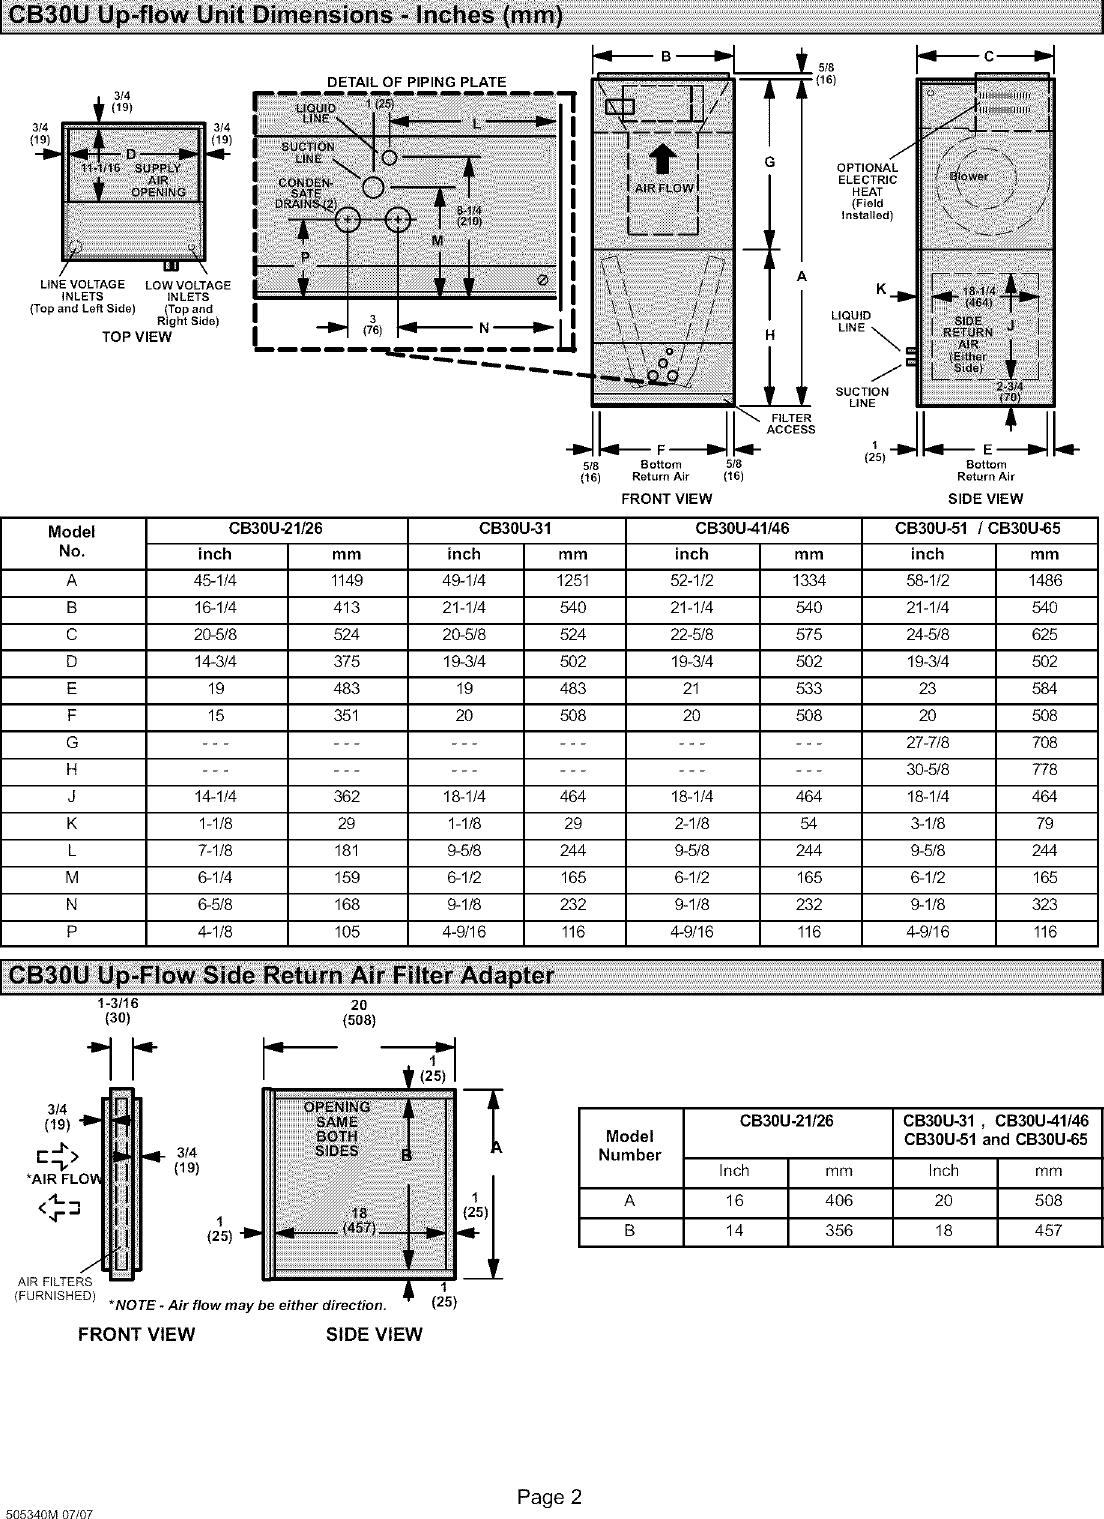 Lennox Air Handler Indoor Blowerevap Manual L0805327 Wiring Diagram Page 2 Of 12